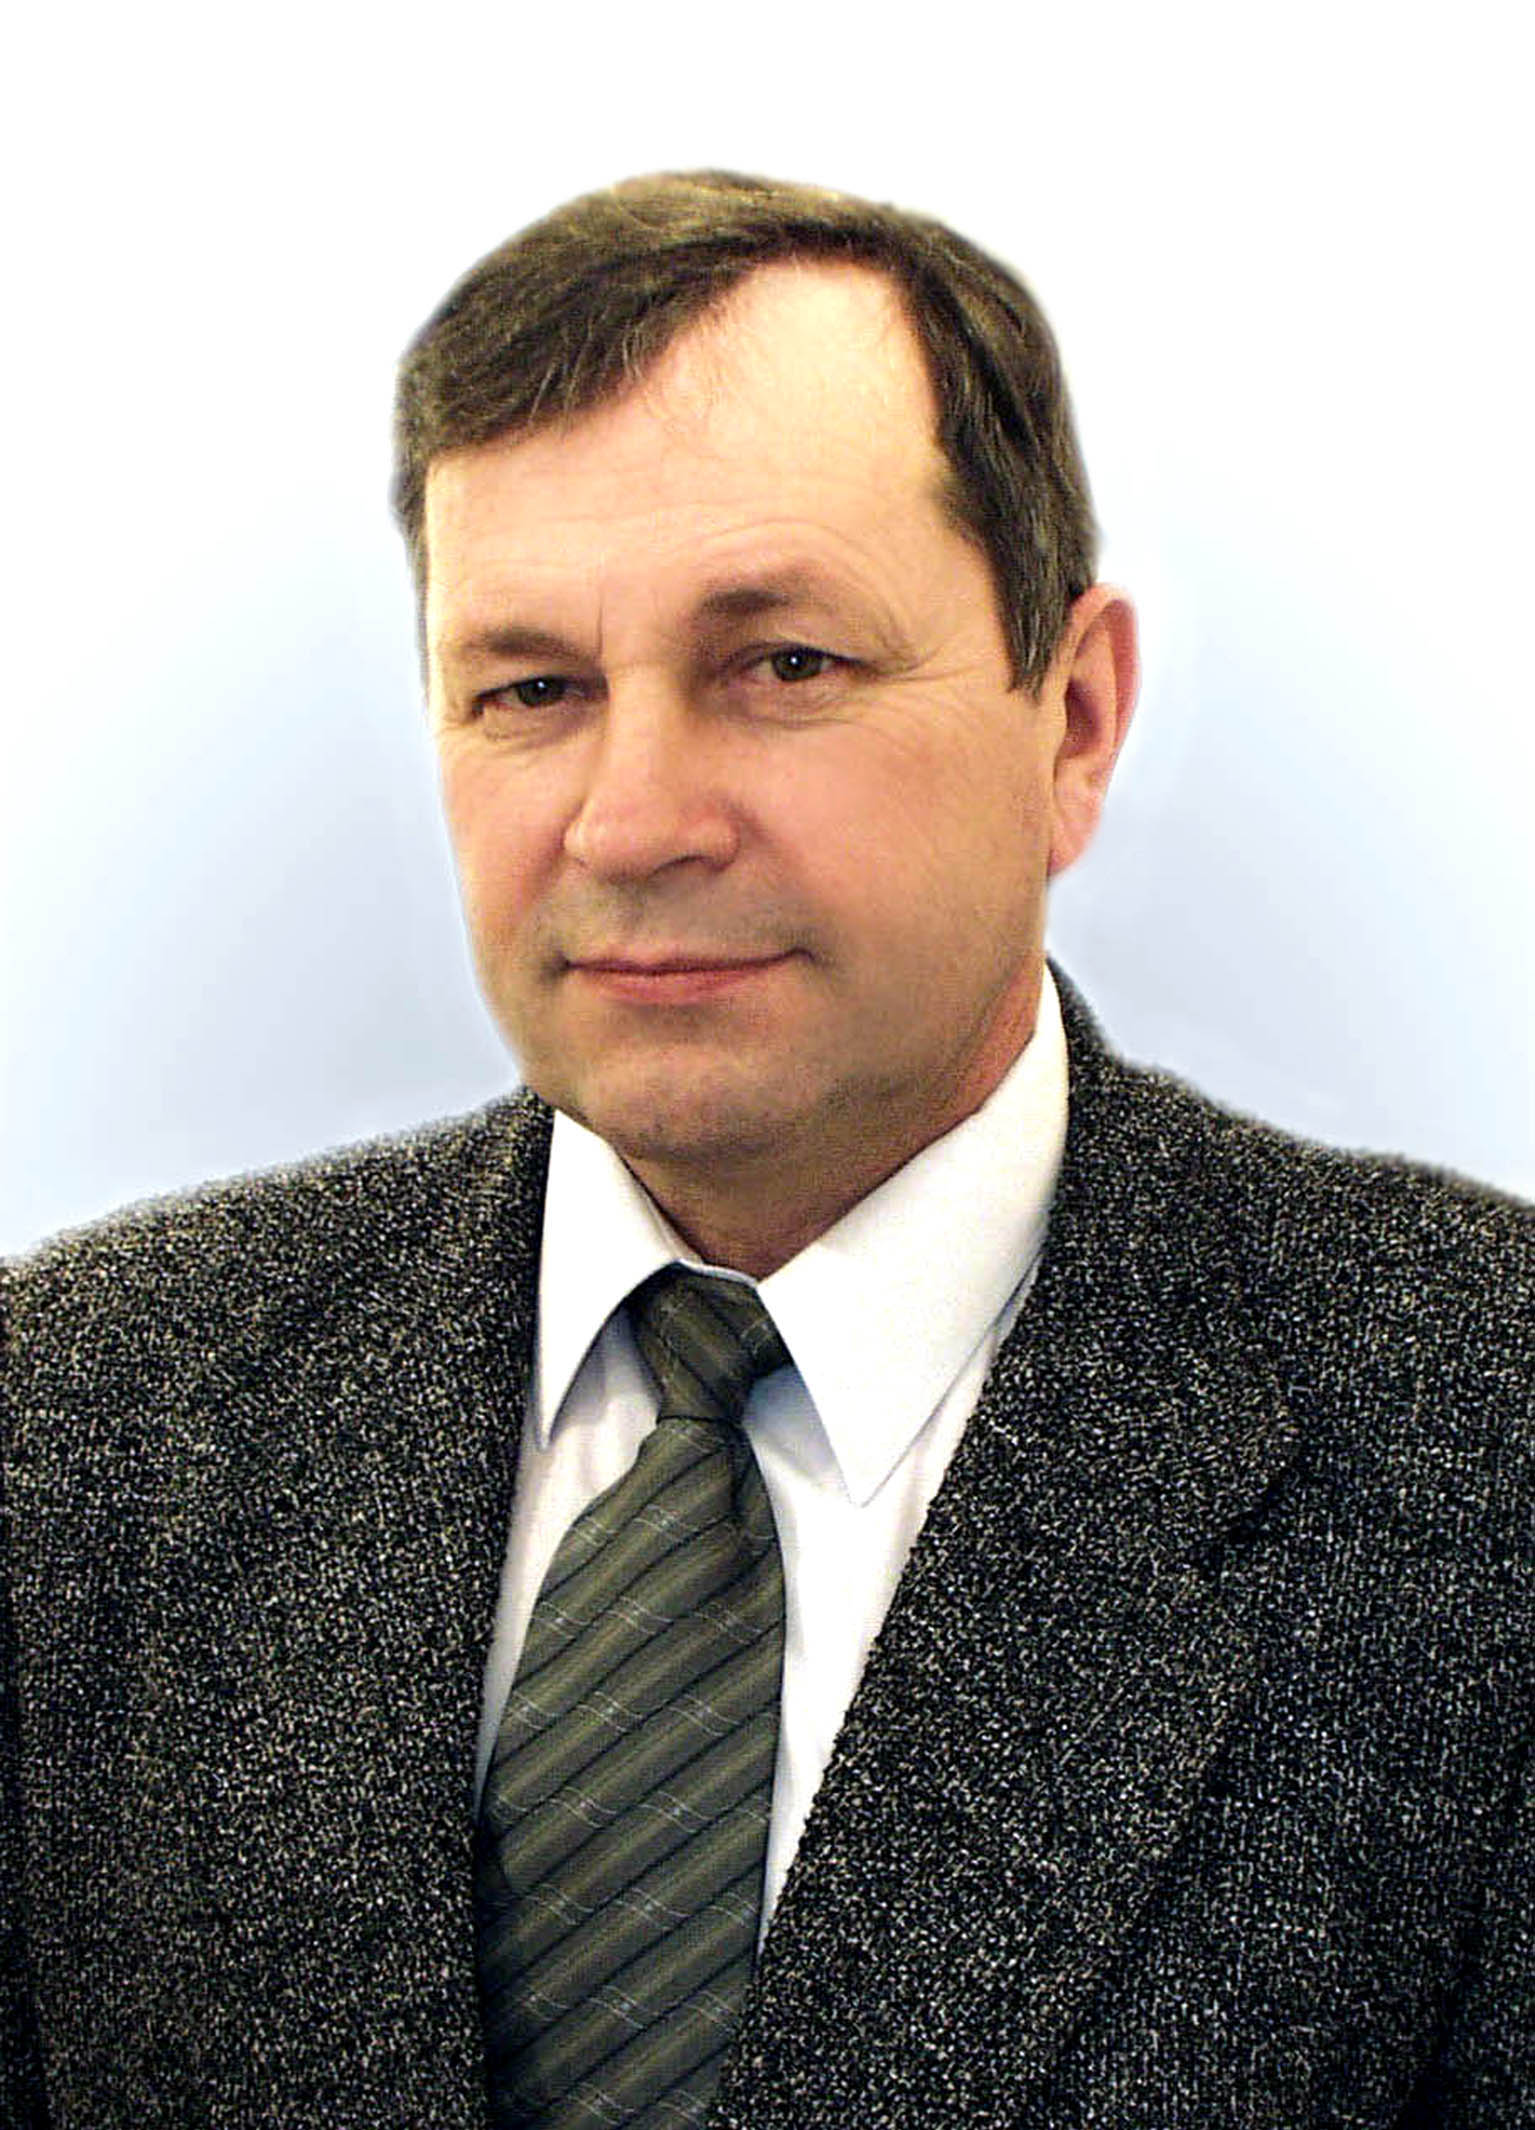 Черевко Вячеслав Михайлович